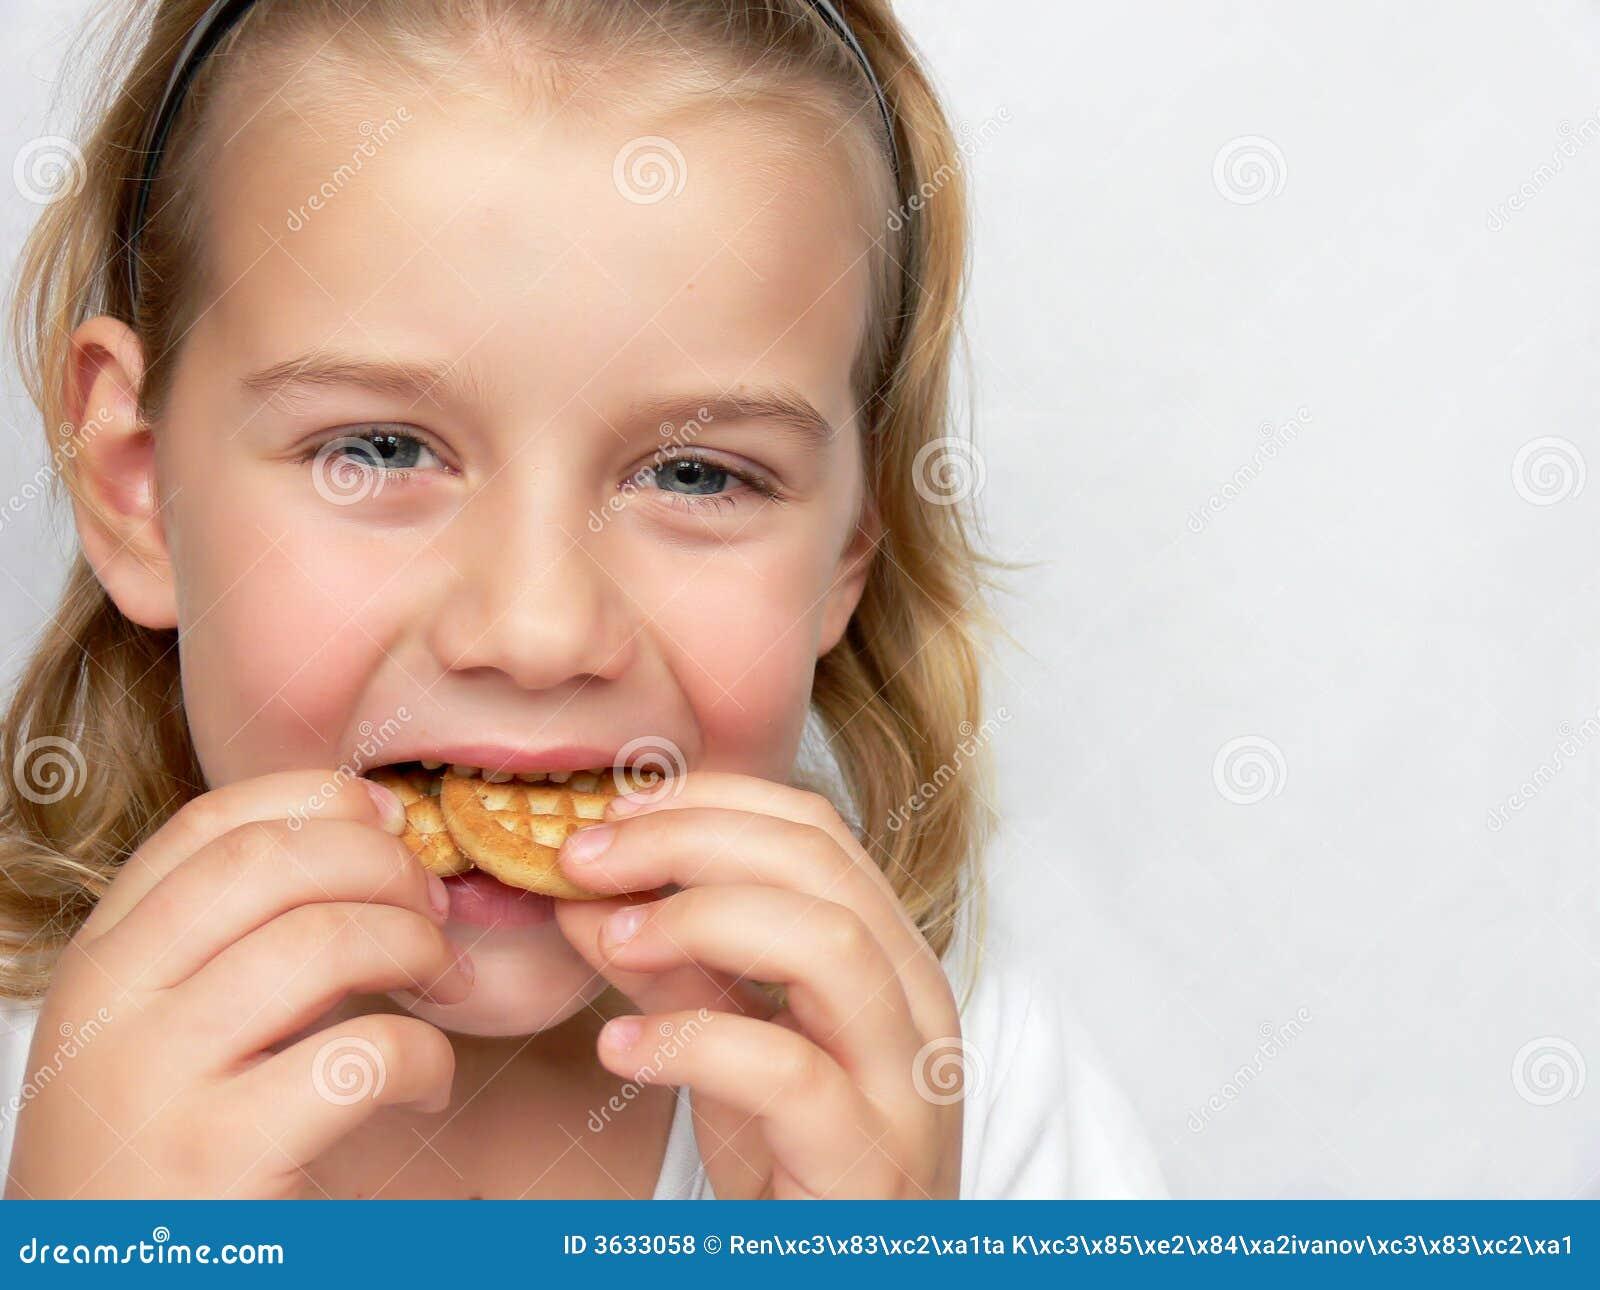 Kind isst Plätzchen